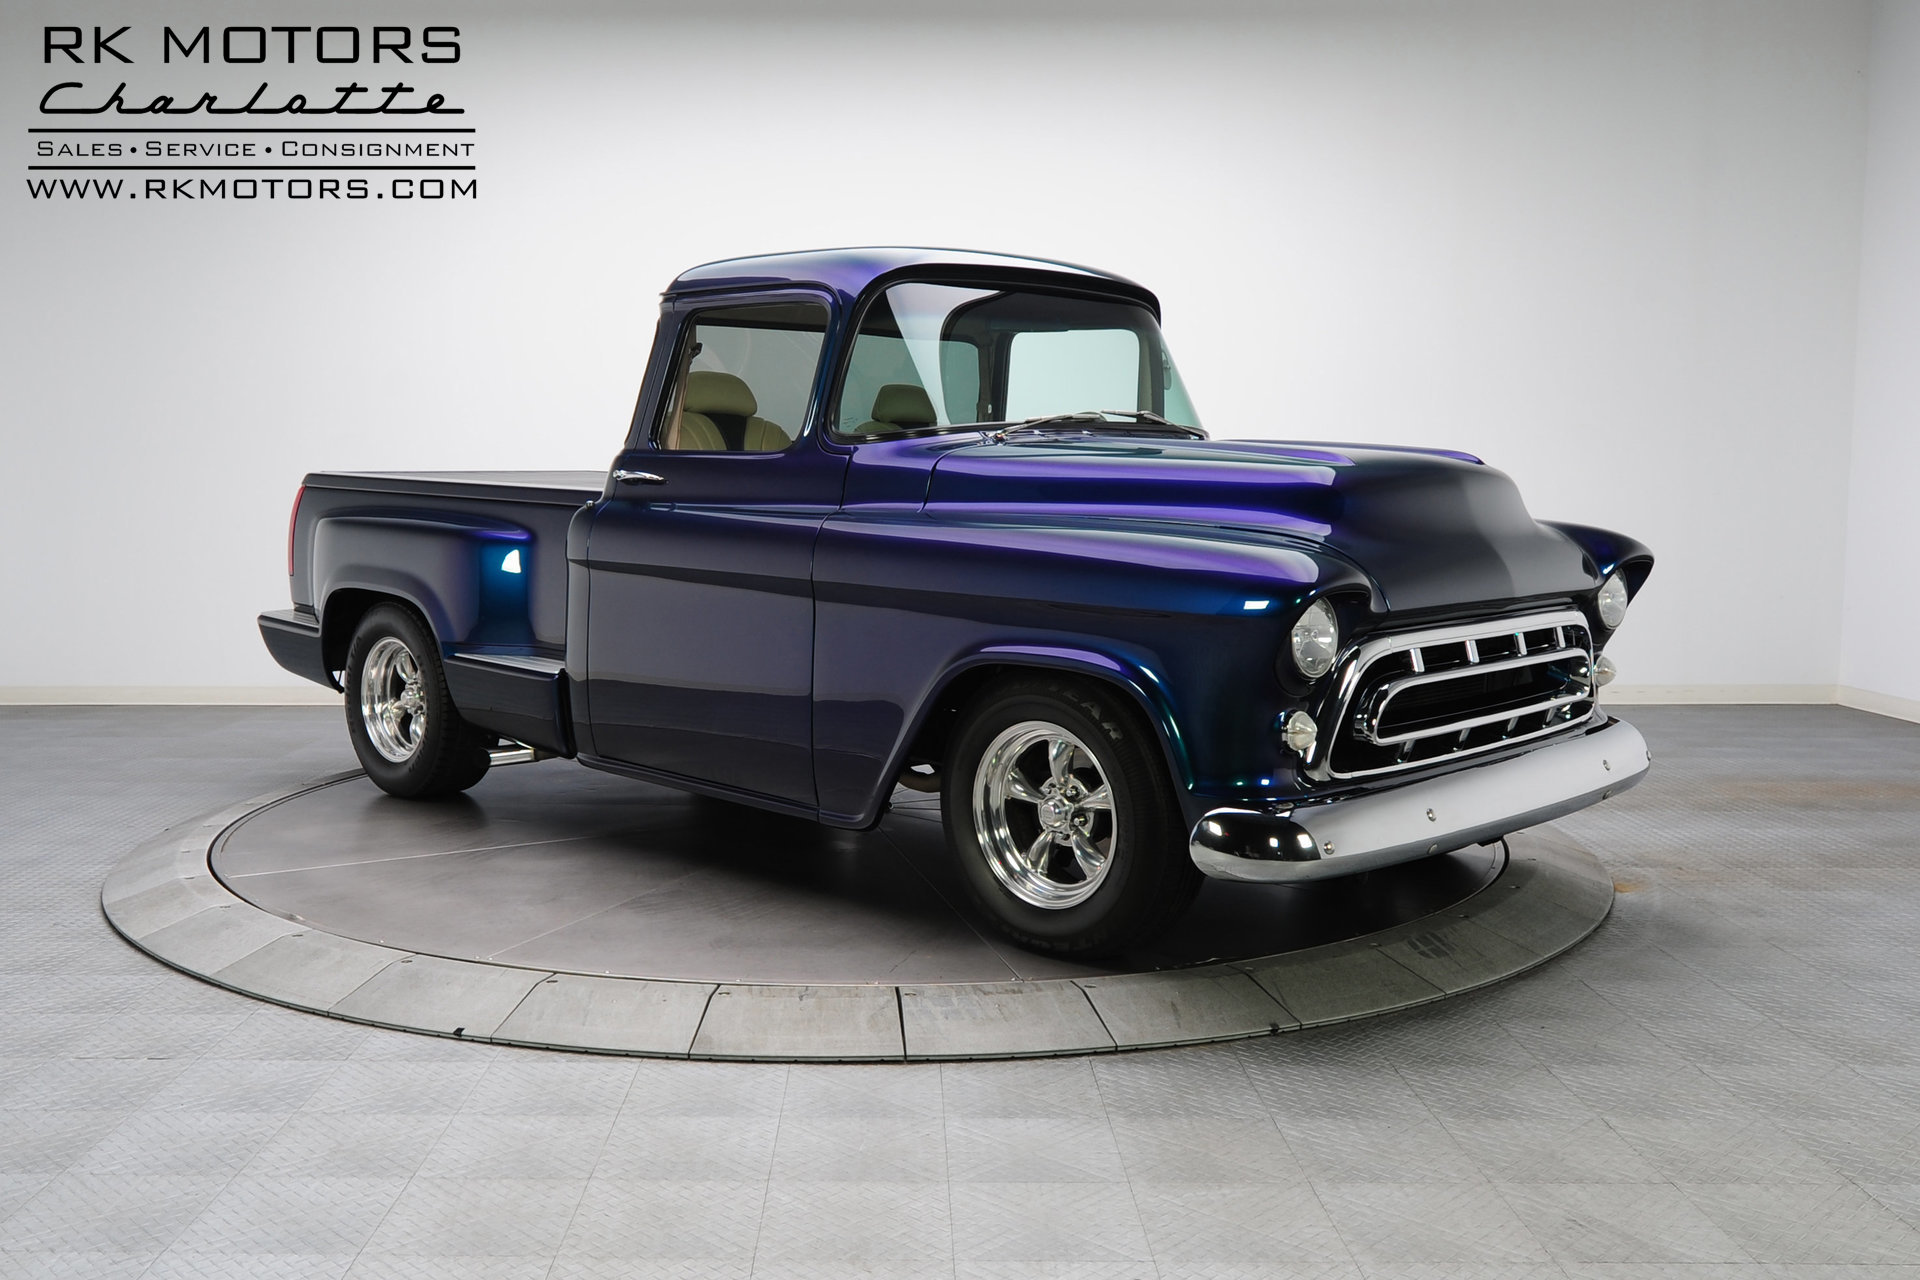 132713 1957 Chevrolet Stepside Rk Motors Classic Cars For Sale Chevy Pickup Truck